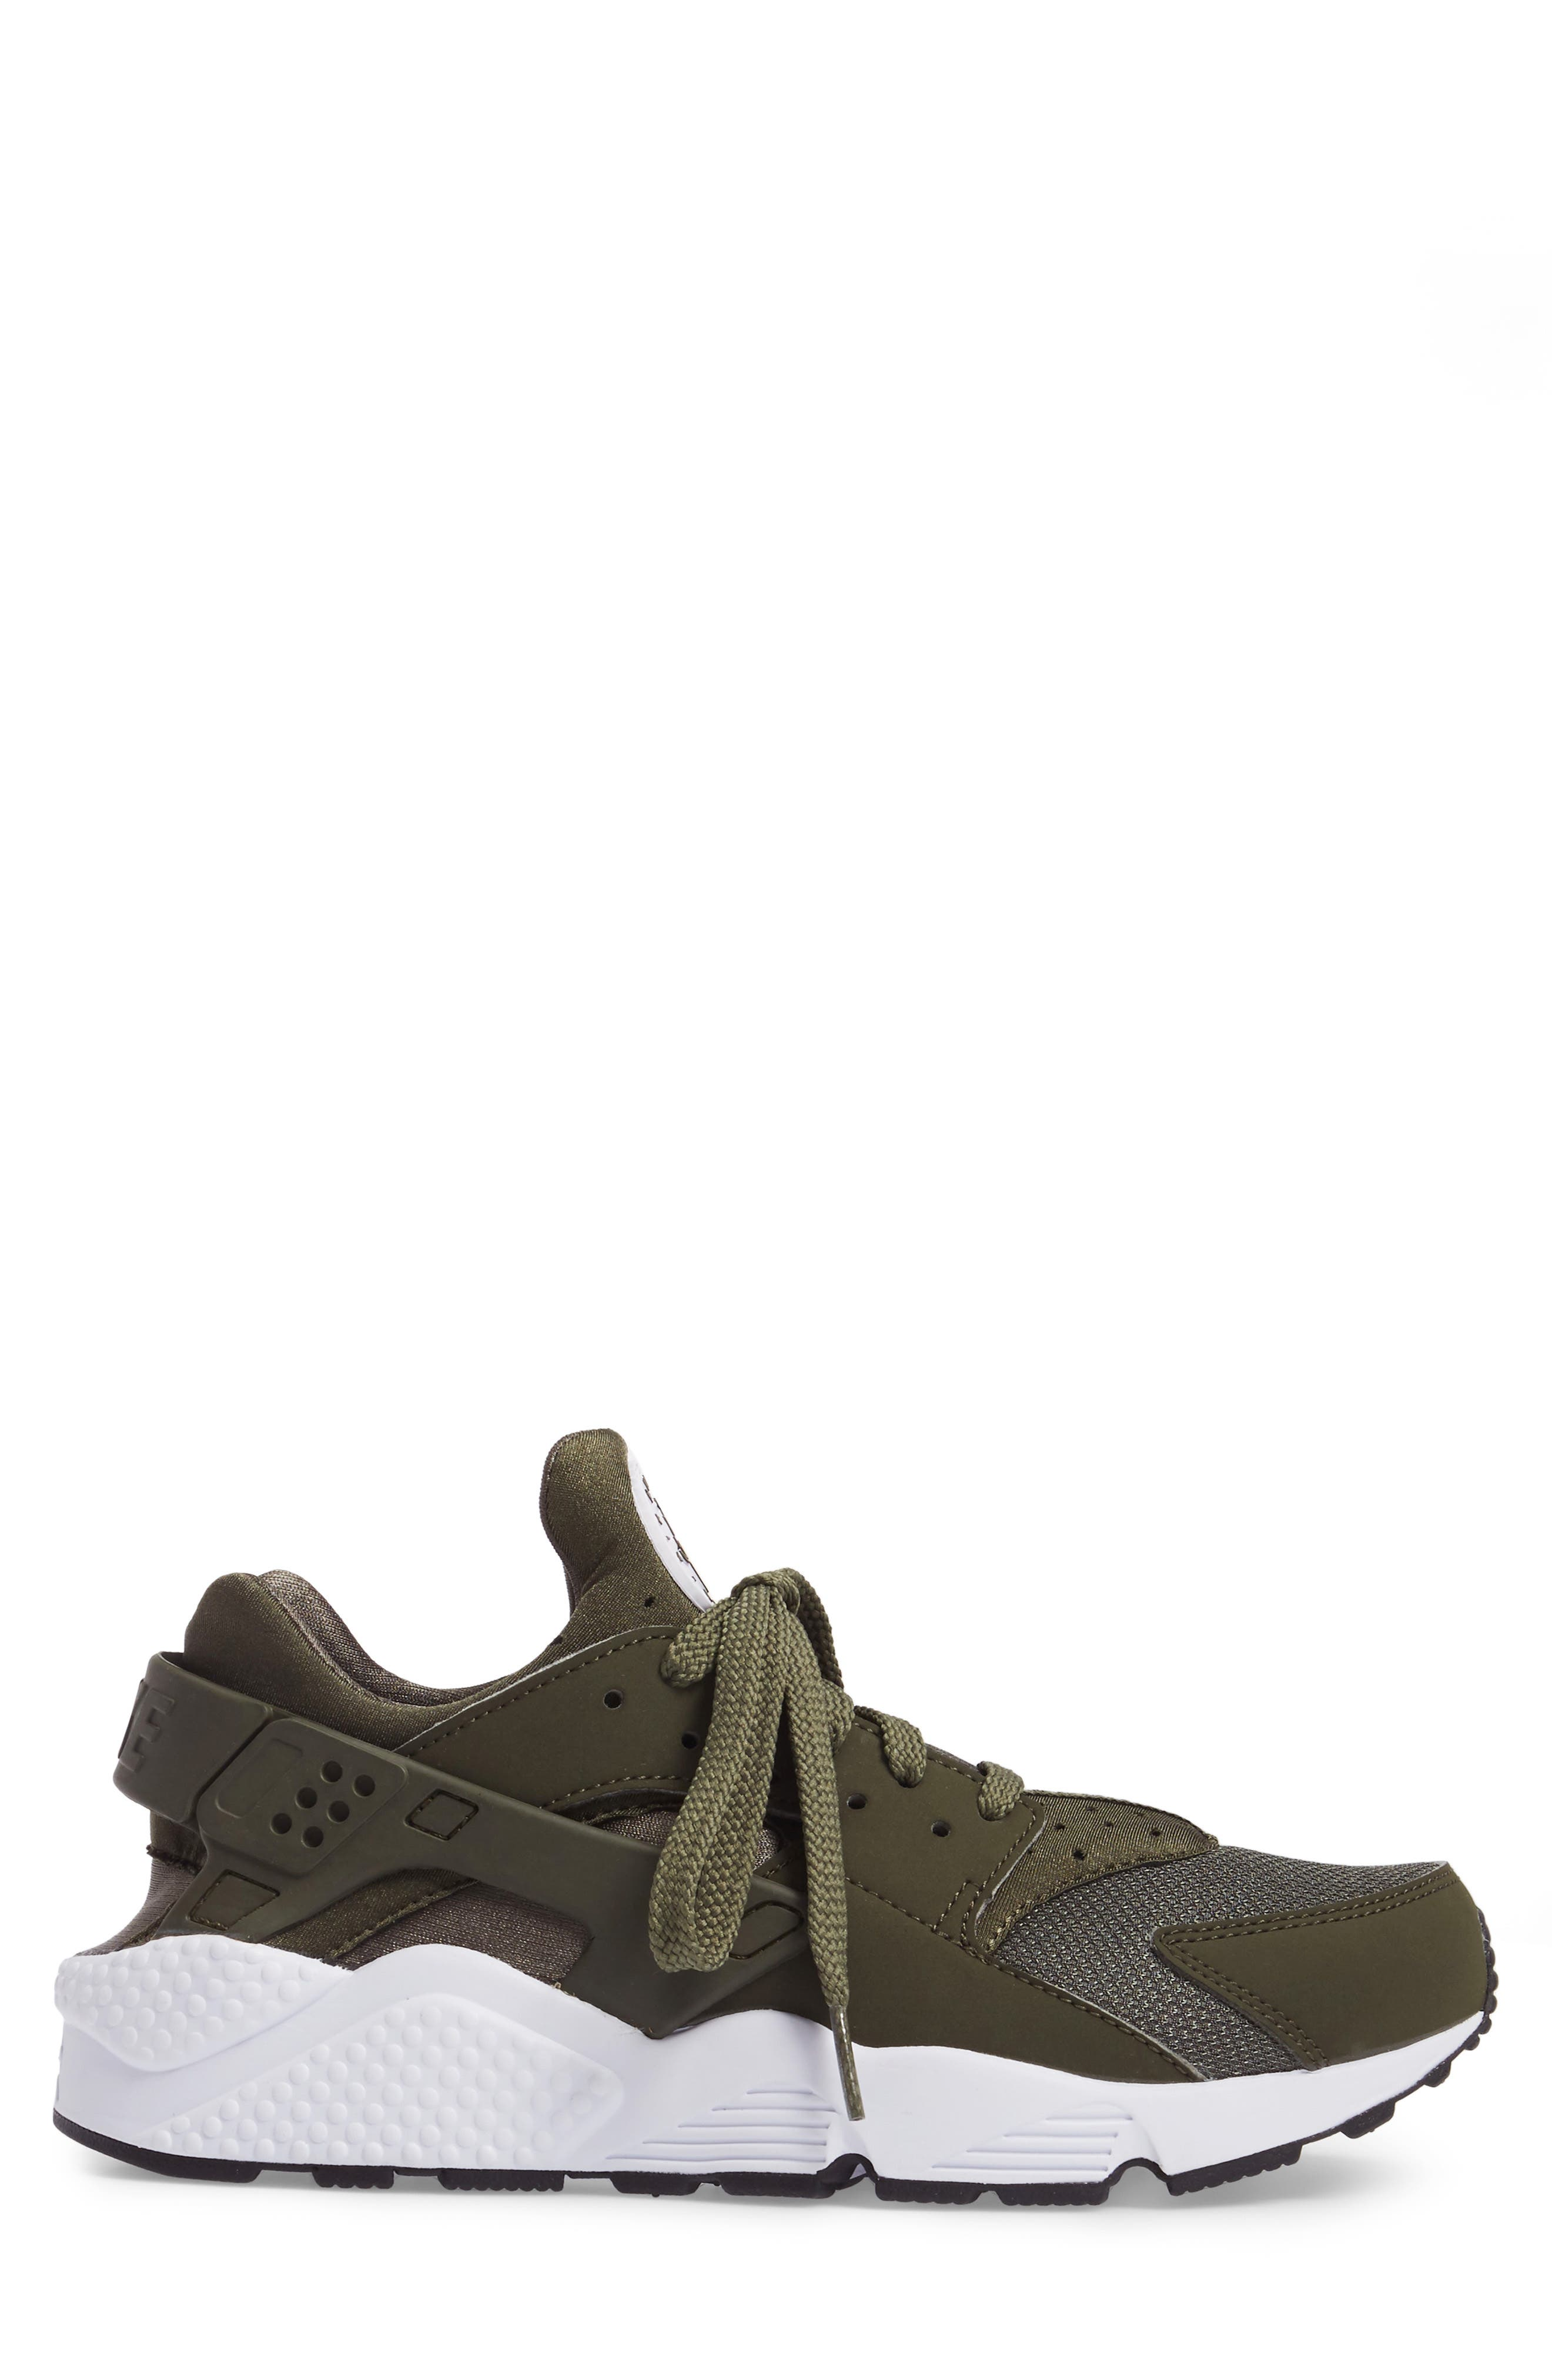 Alternate Image 3  - Nike 'Air Huarache' Sneaker (Men)